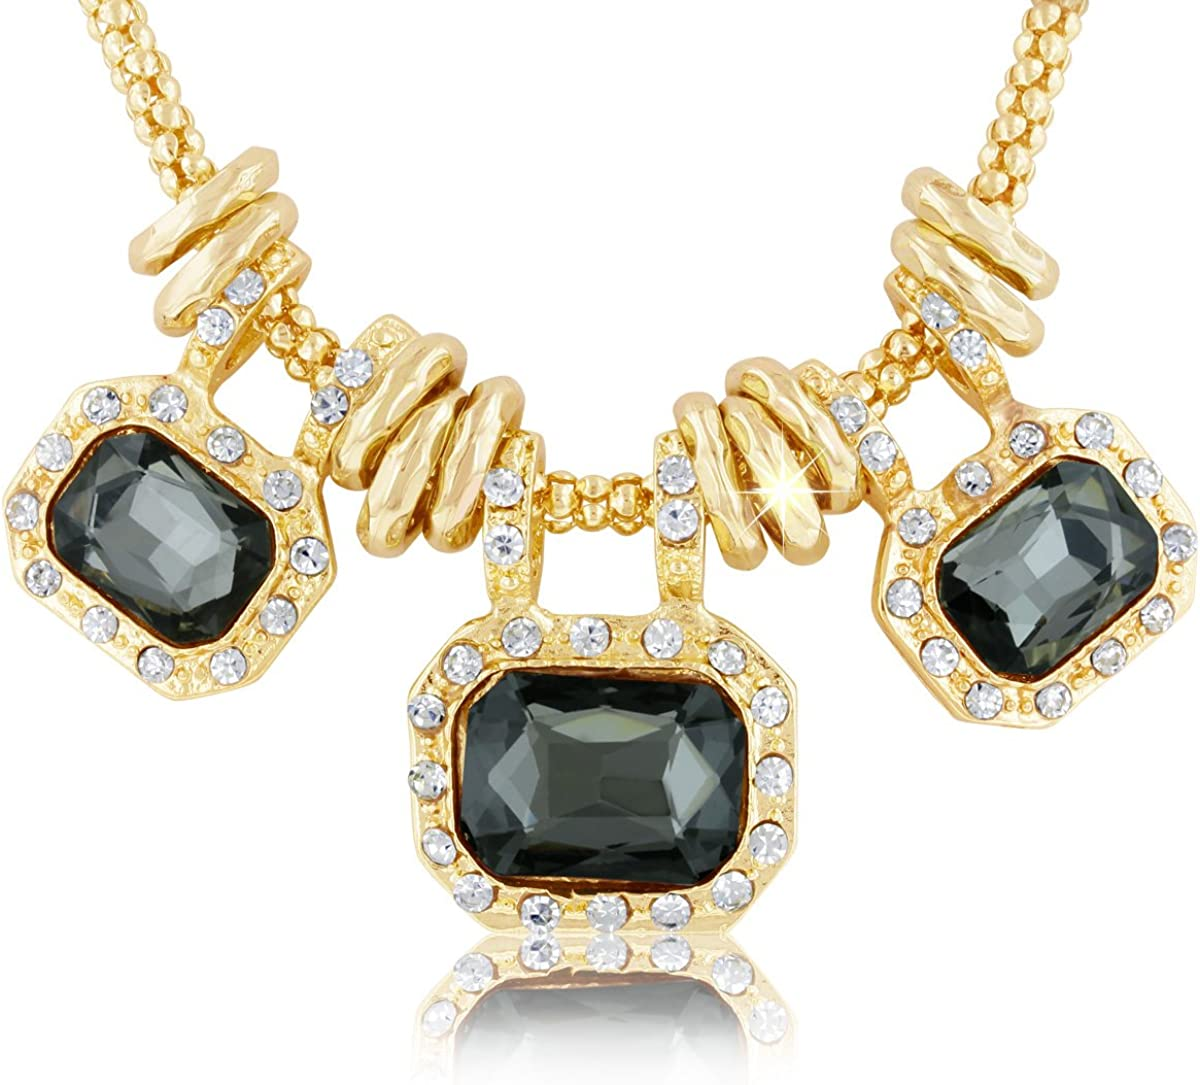 Sparkle Bargains Crystal Statement Women's Fashion Necklace